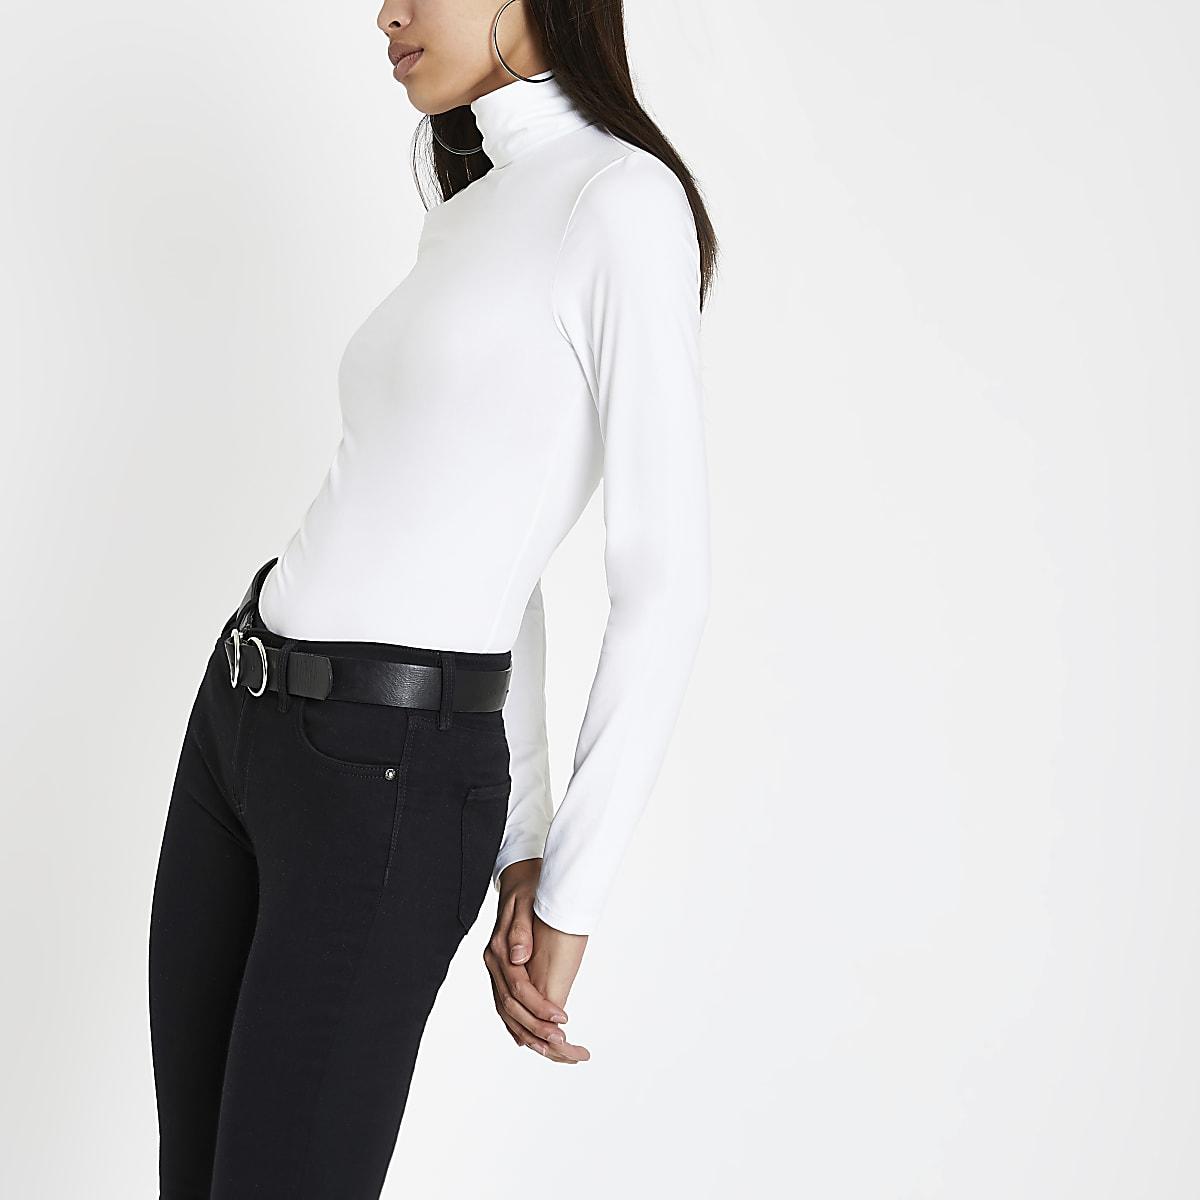 White slinky roll neck top